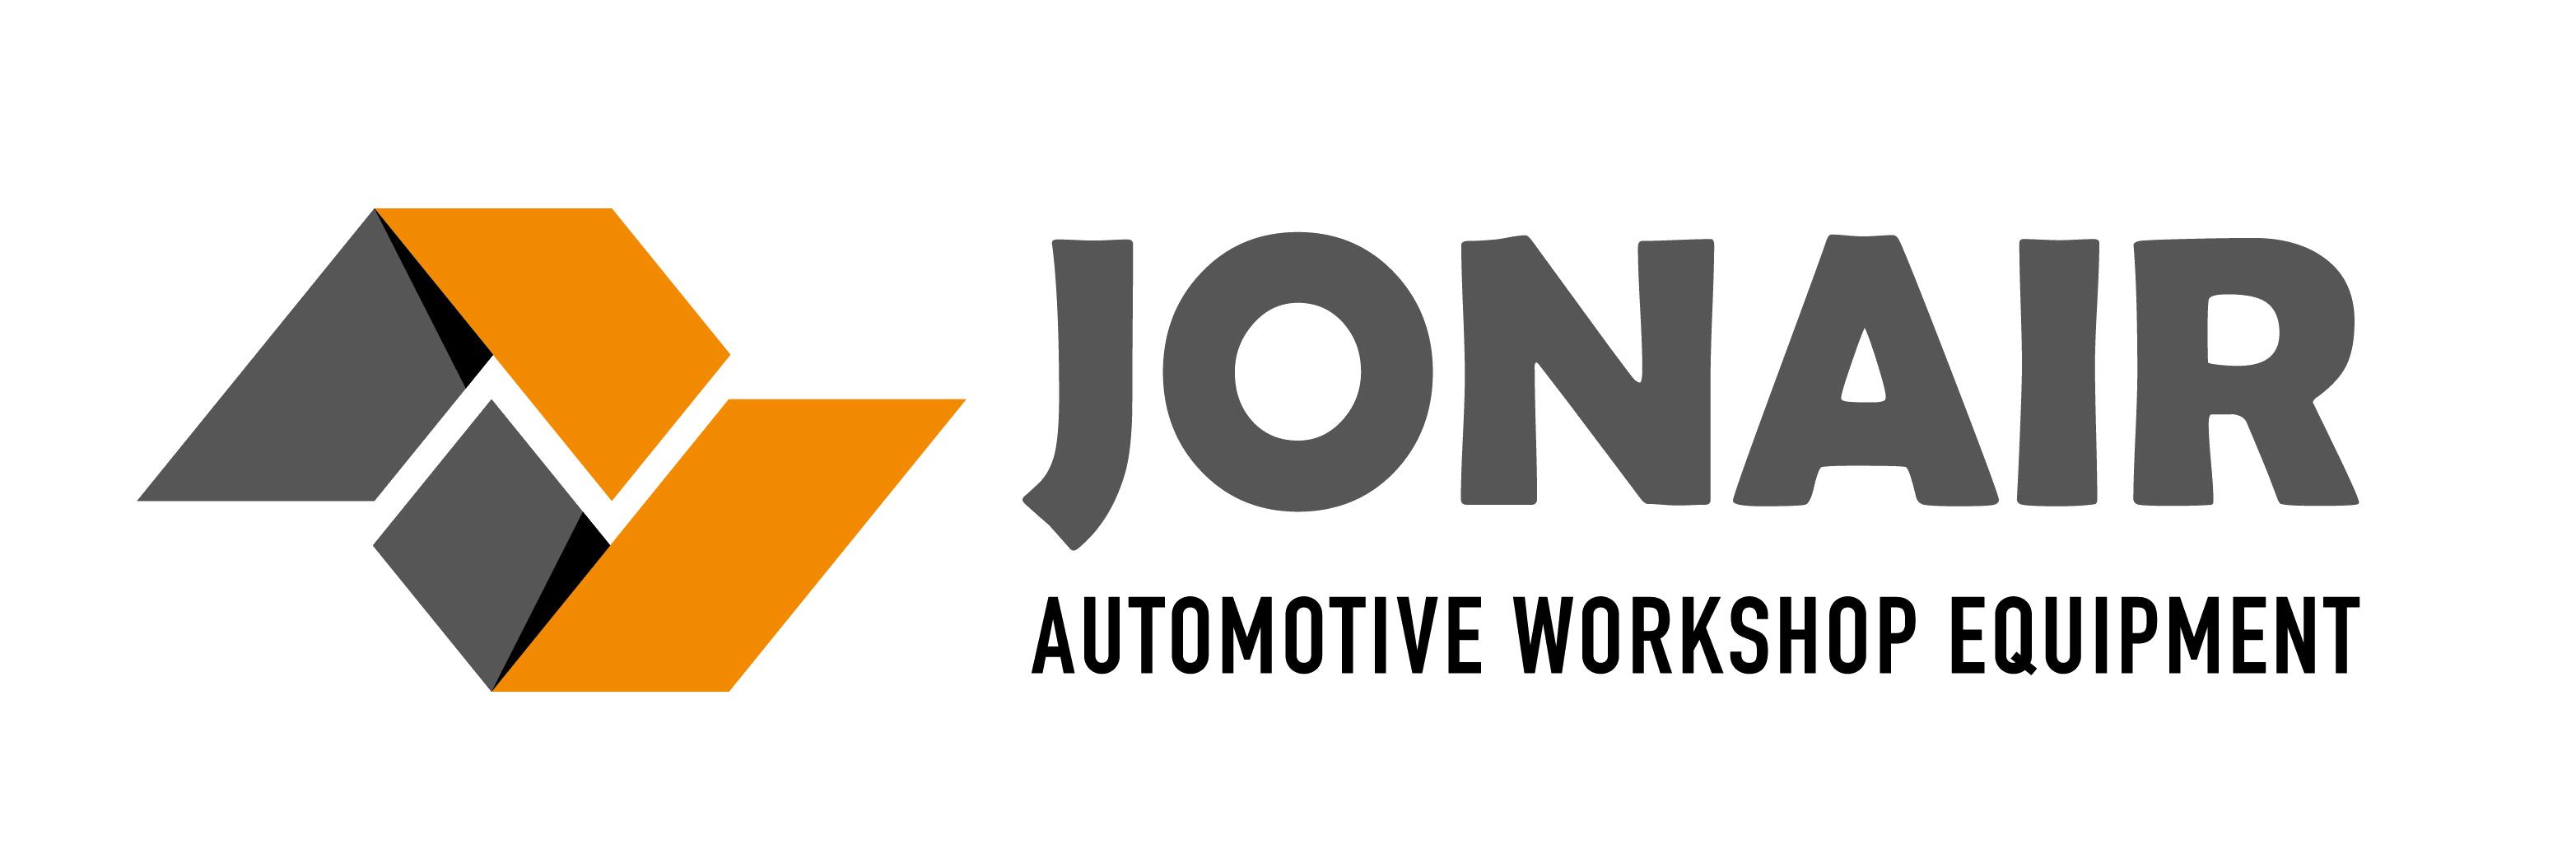 Jonair